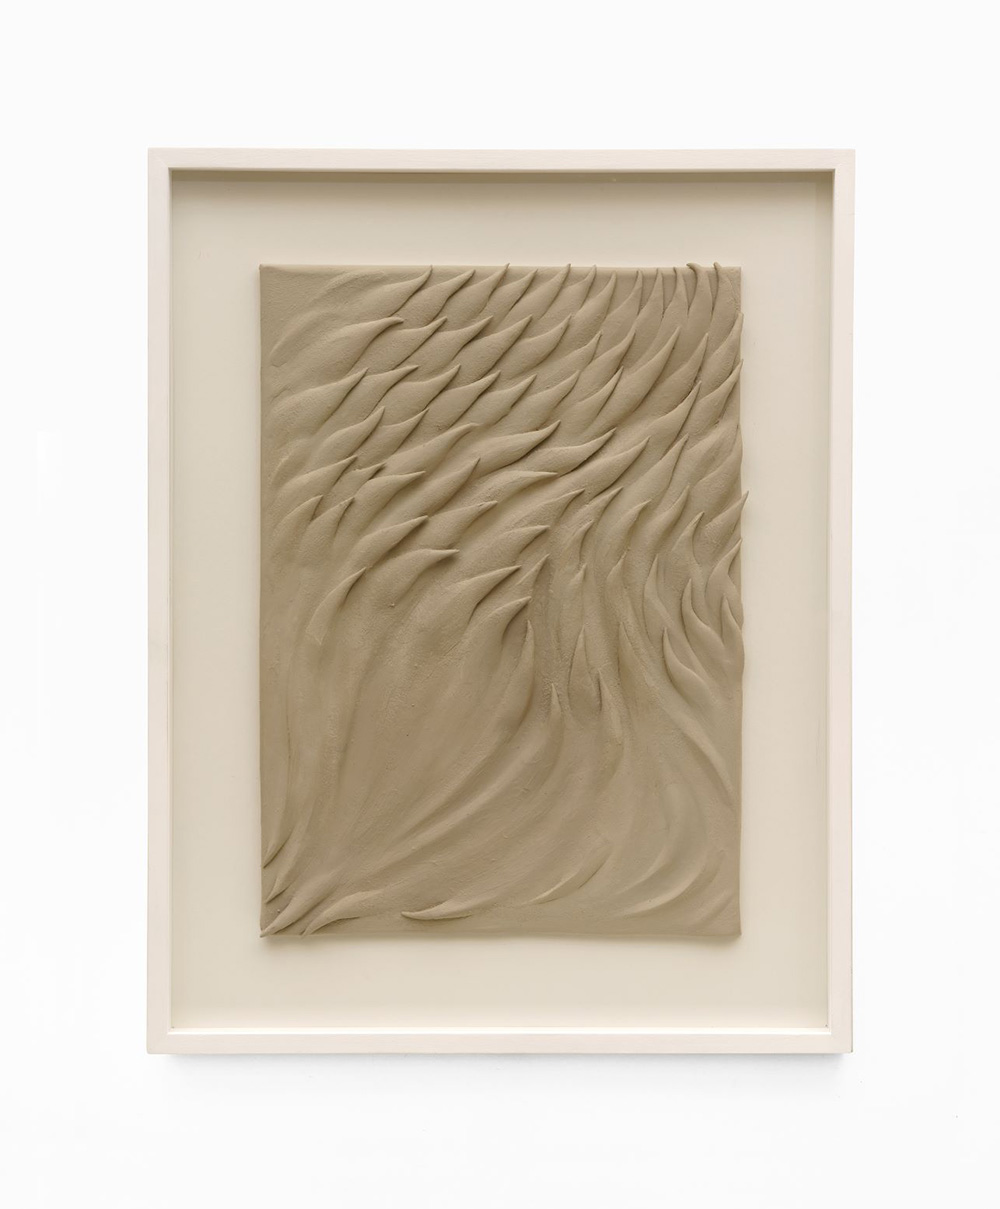 03_Riverscape (Keramik) Immanuel Birkert Riverscape (2), 2020 Öl auf Keramik 45 x 35 cm, gerahmt